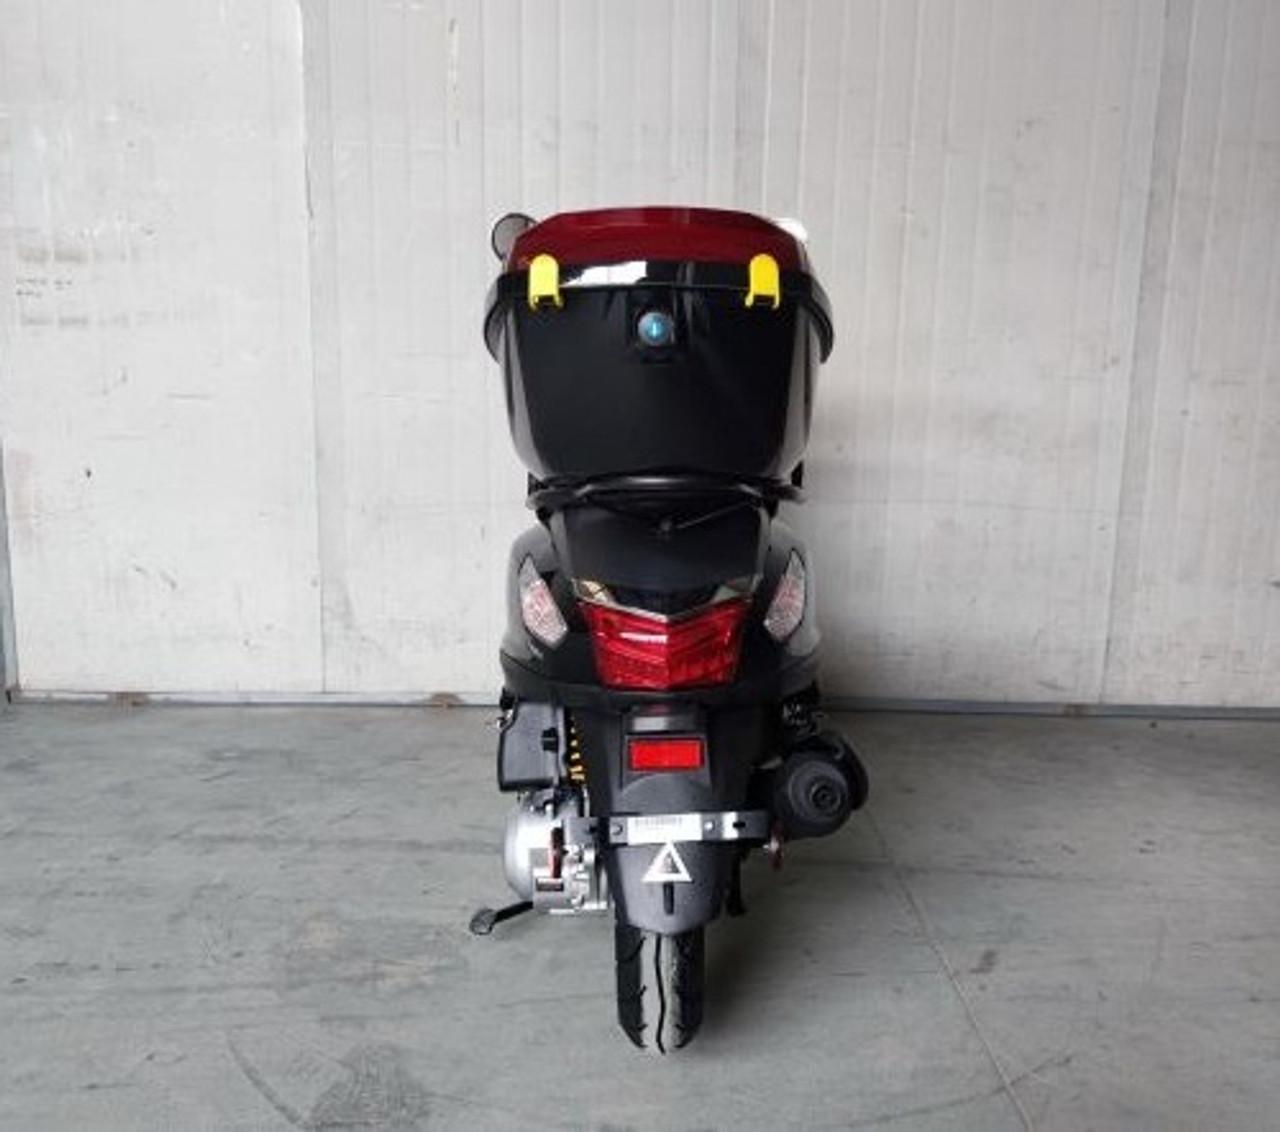 MC-172-150 (2021) Scooter, 4-Stroke Eletric / Kick Start